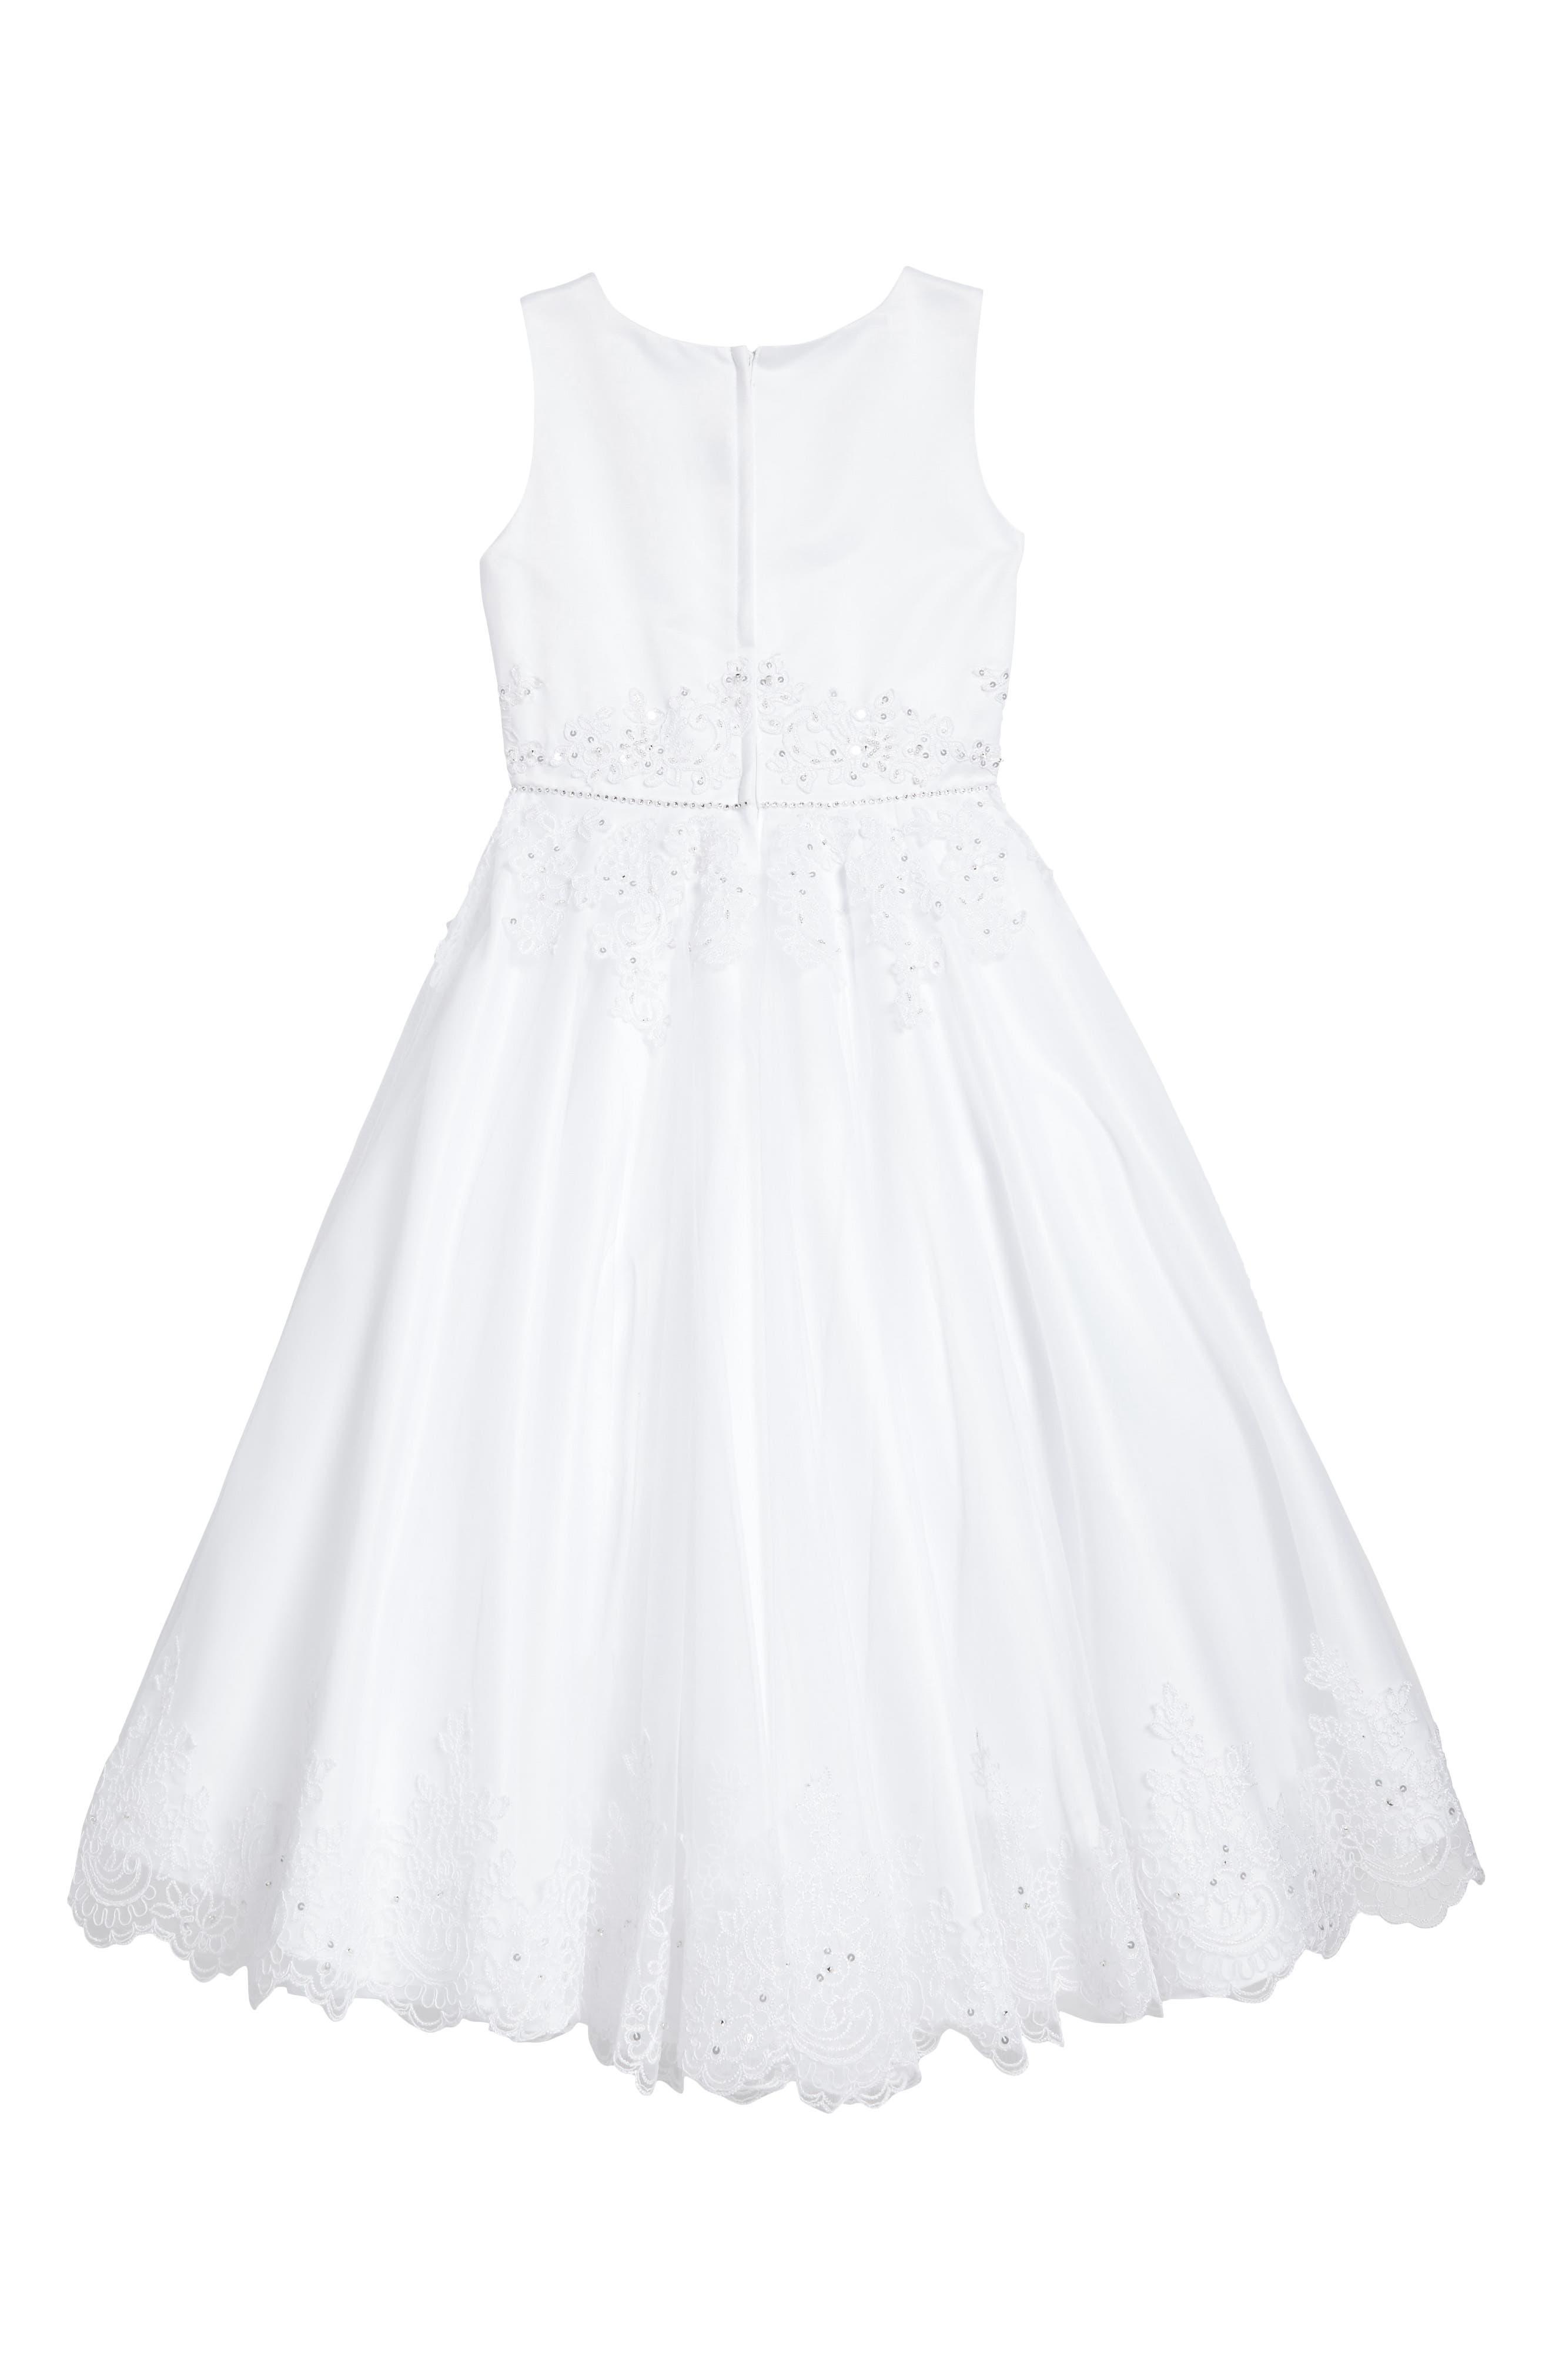 Satin & Tulle First Communion Dress,                             Alternate thumbnail 2, color,                             White